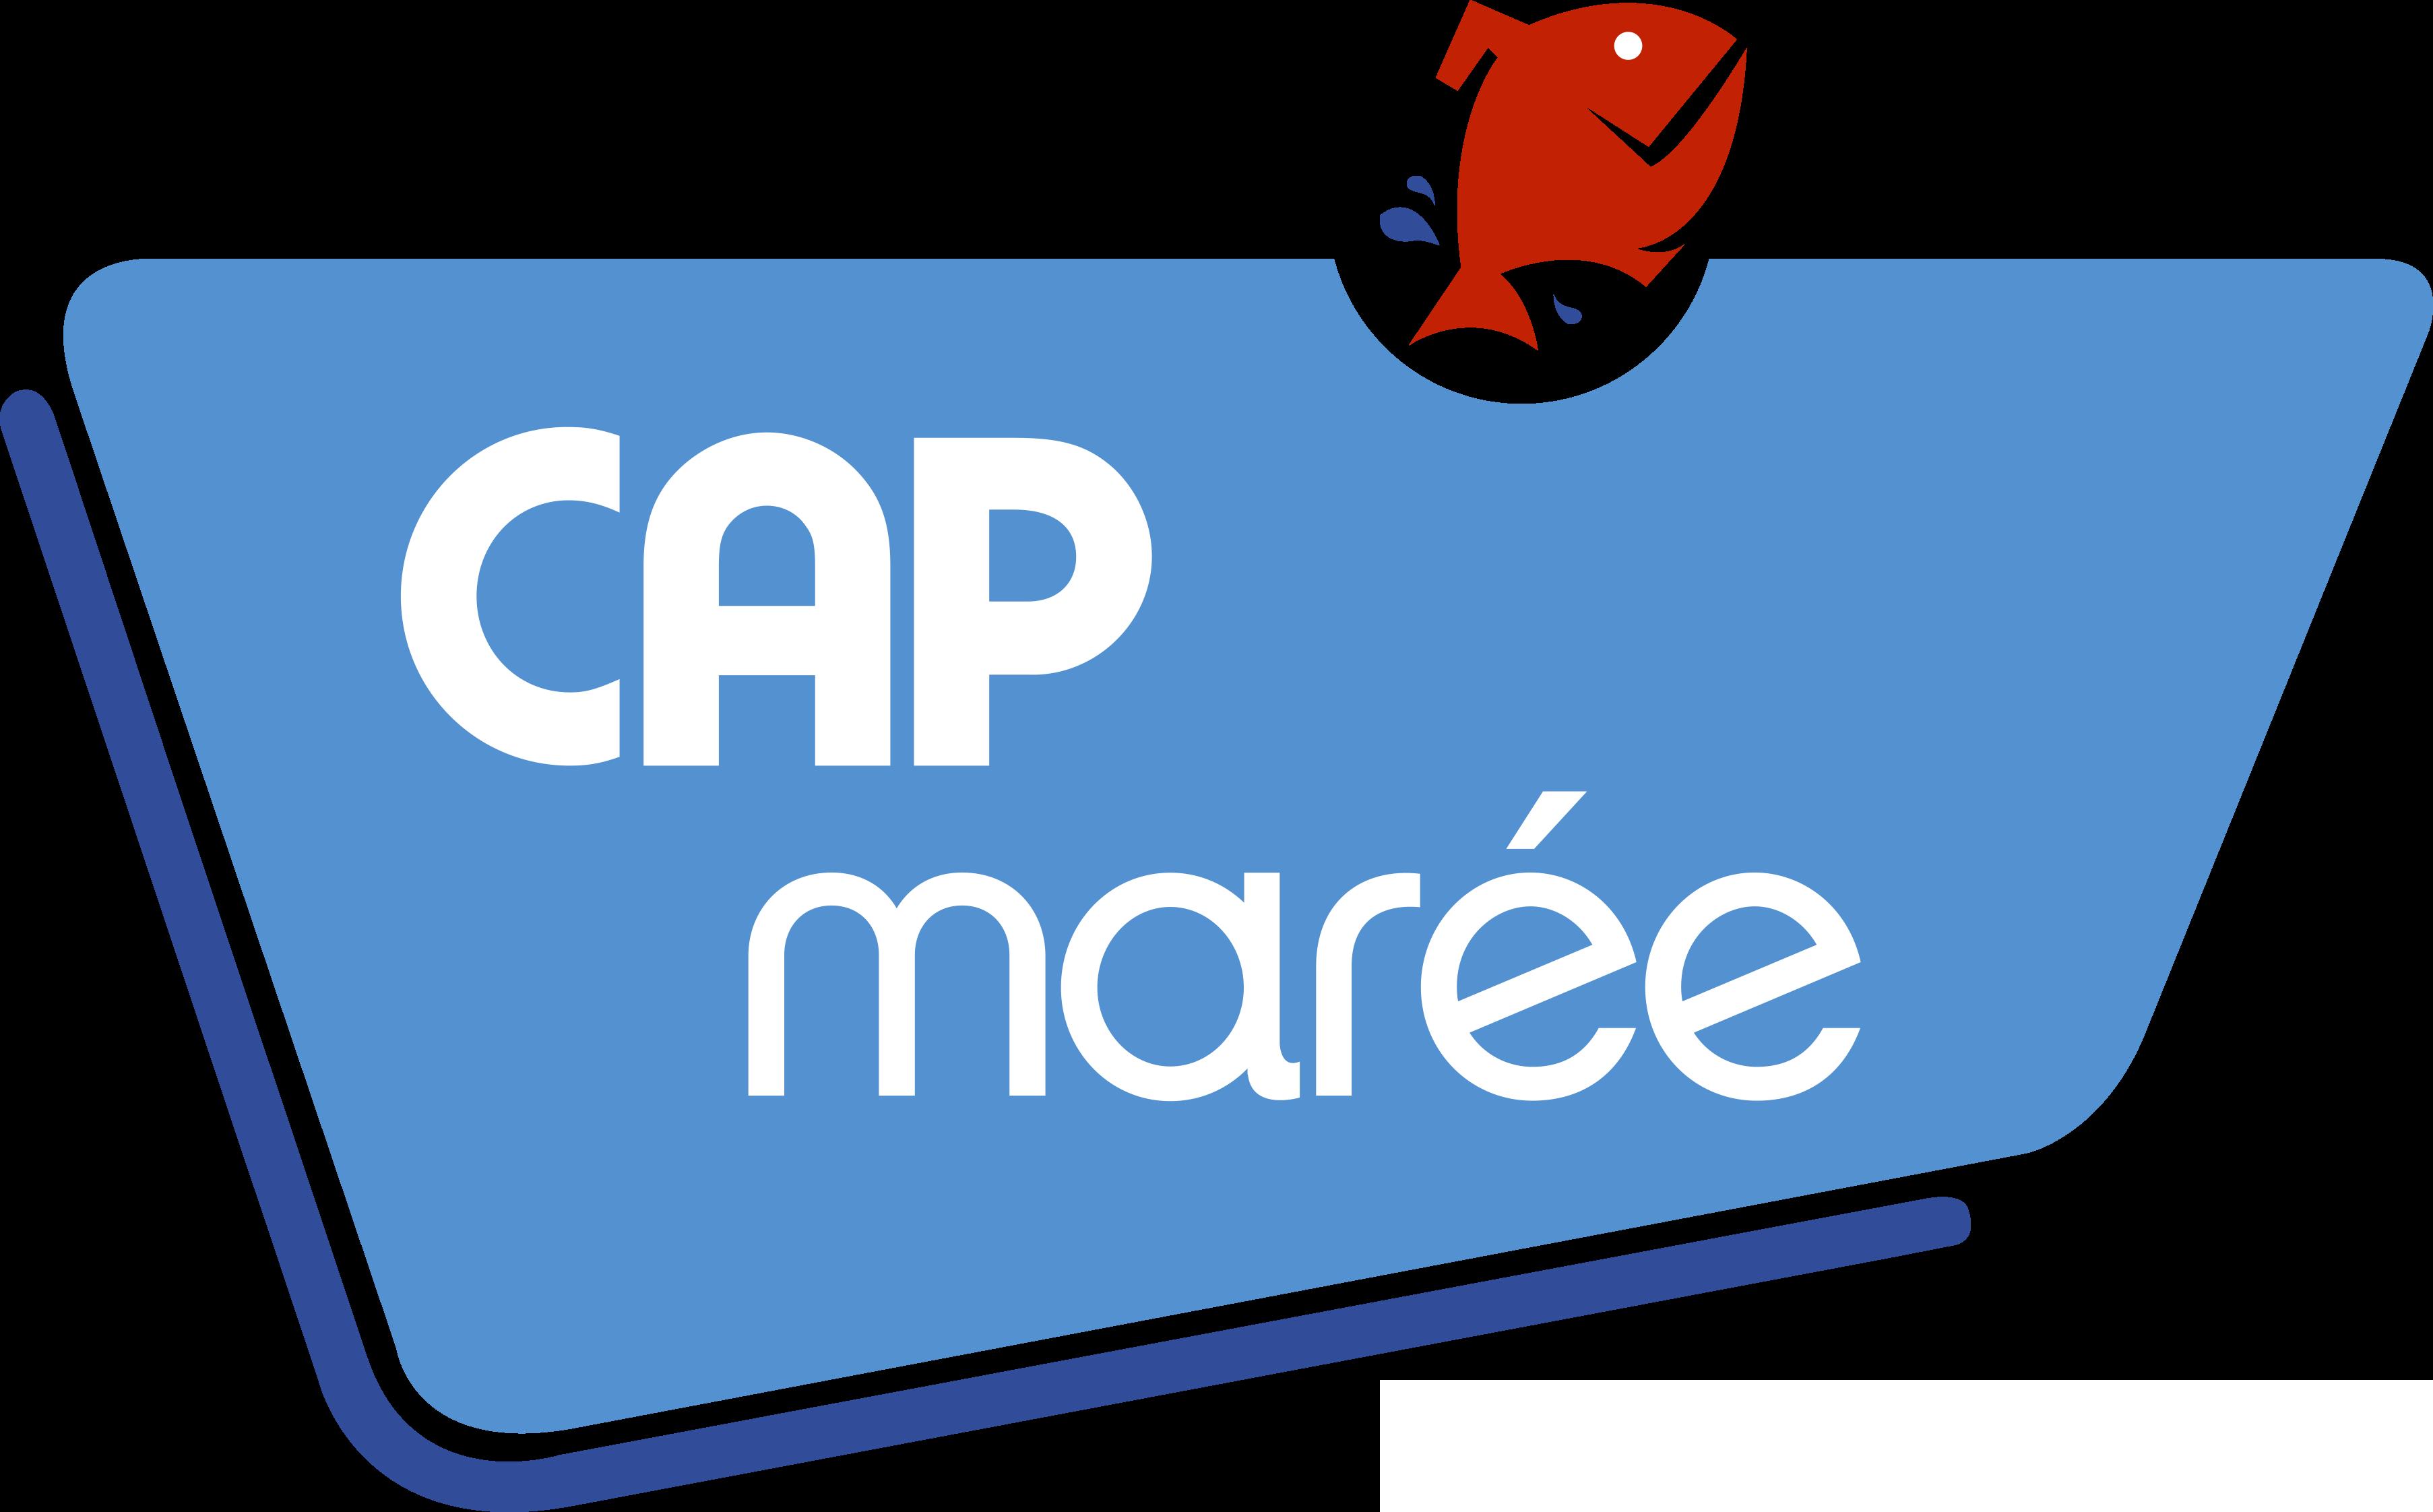 CapMaree_RVB